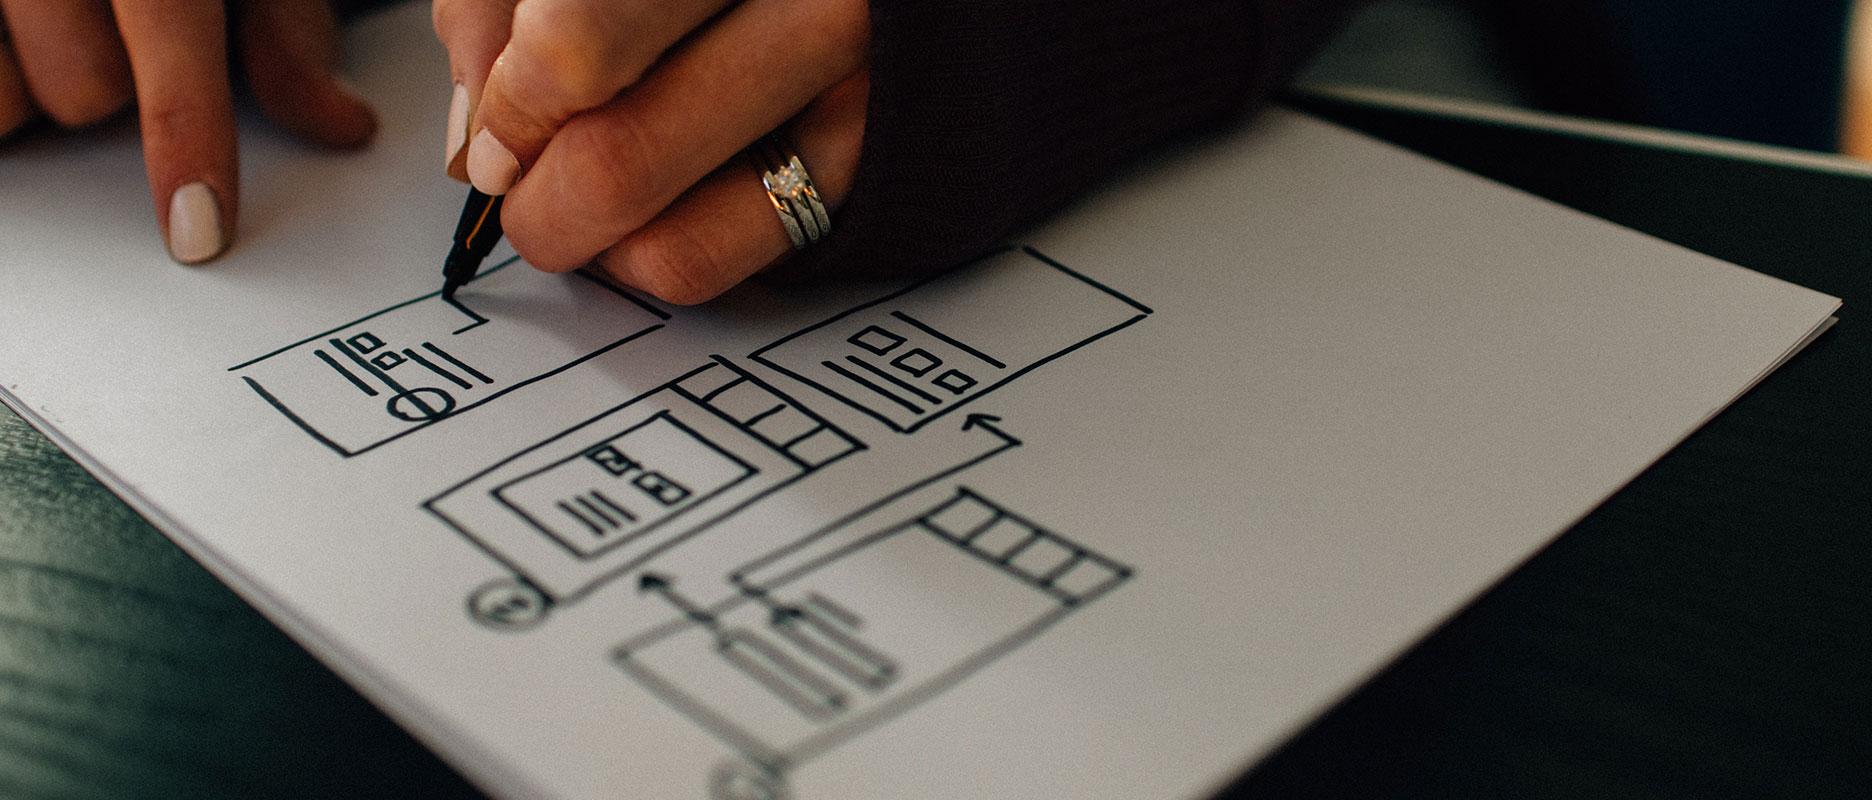 A person drawing a design scheme